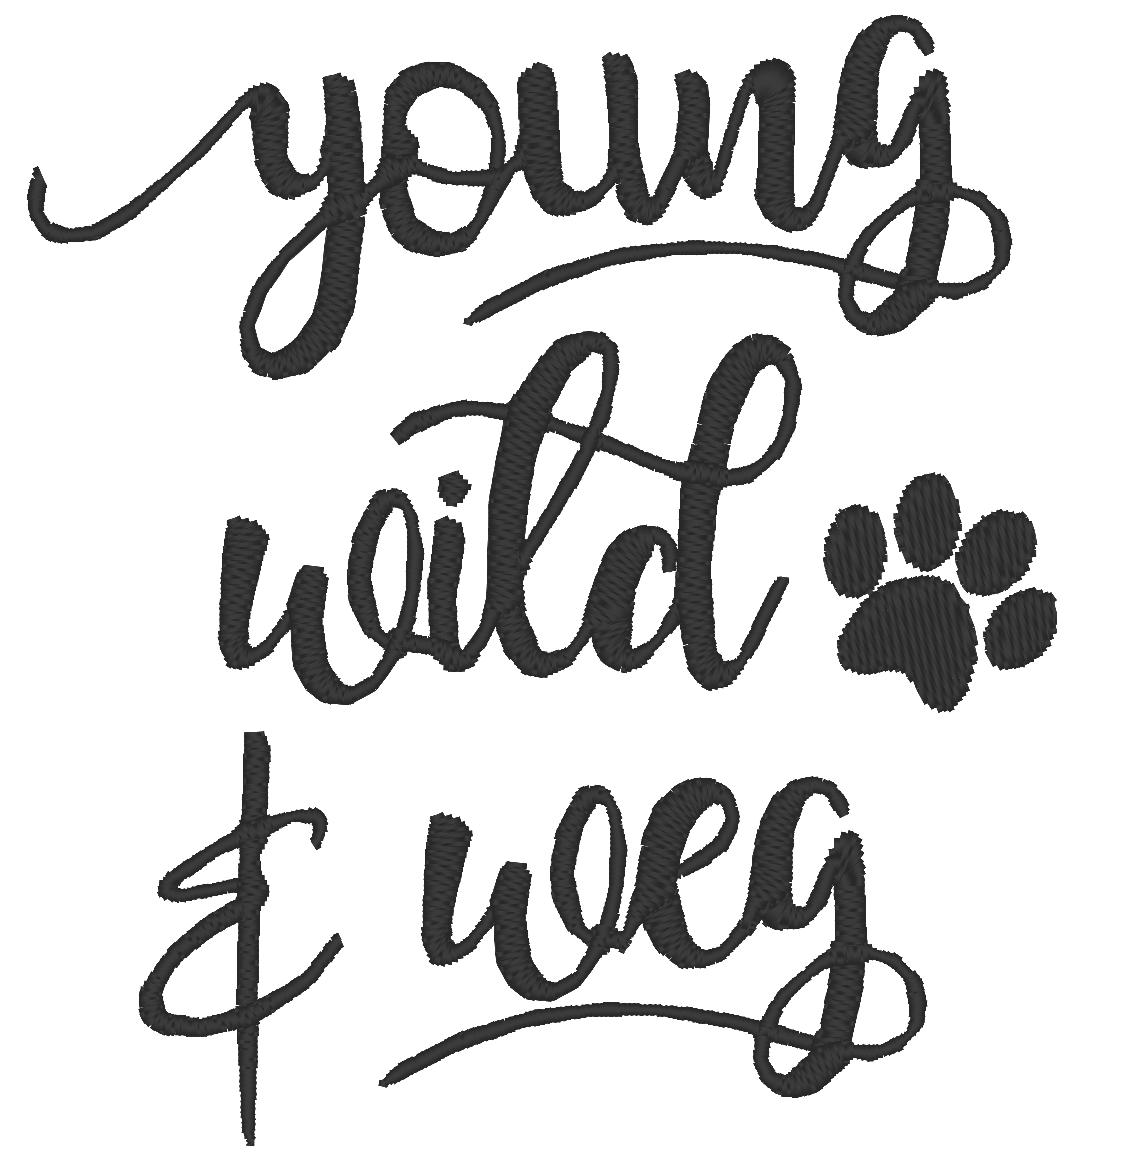 Young_wild_and_weg